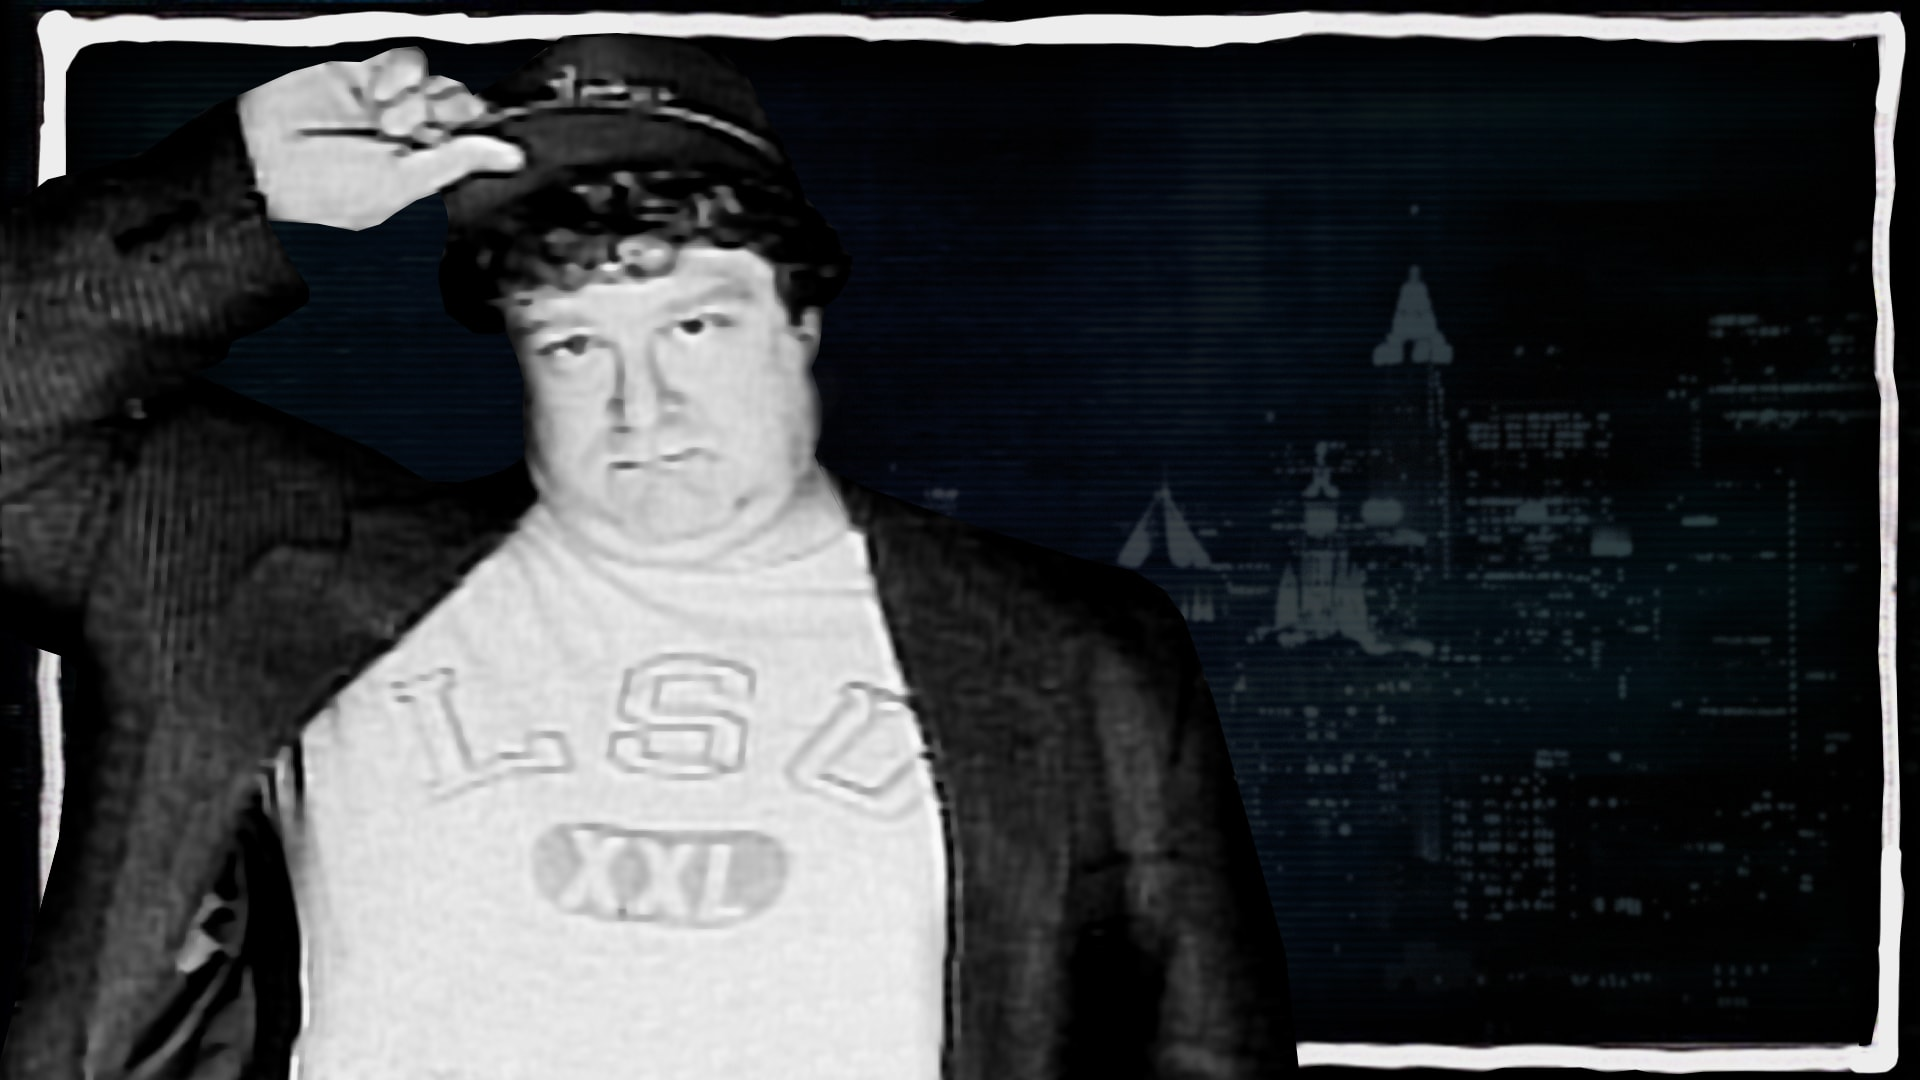 John Goodman: December 2, 1989